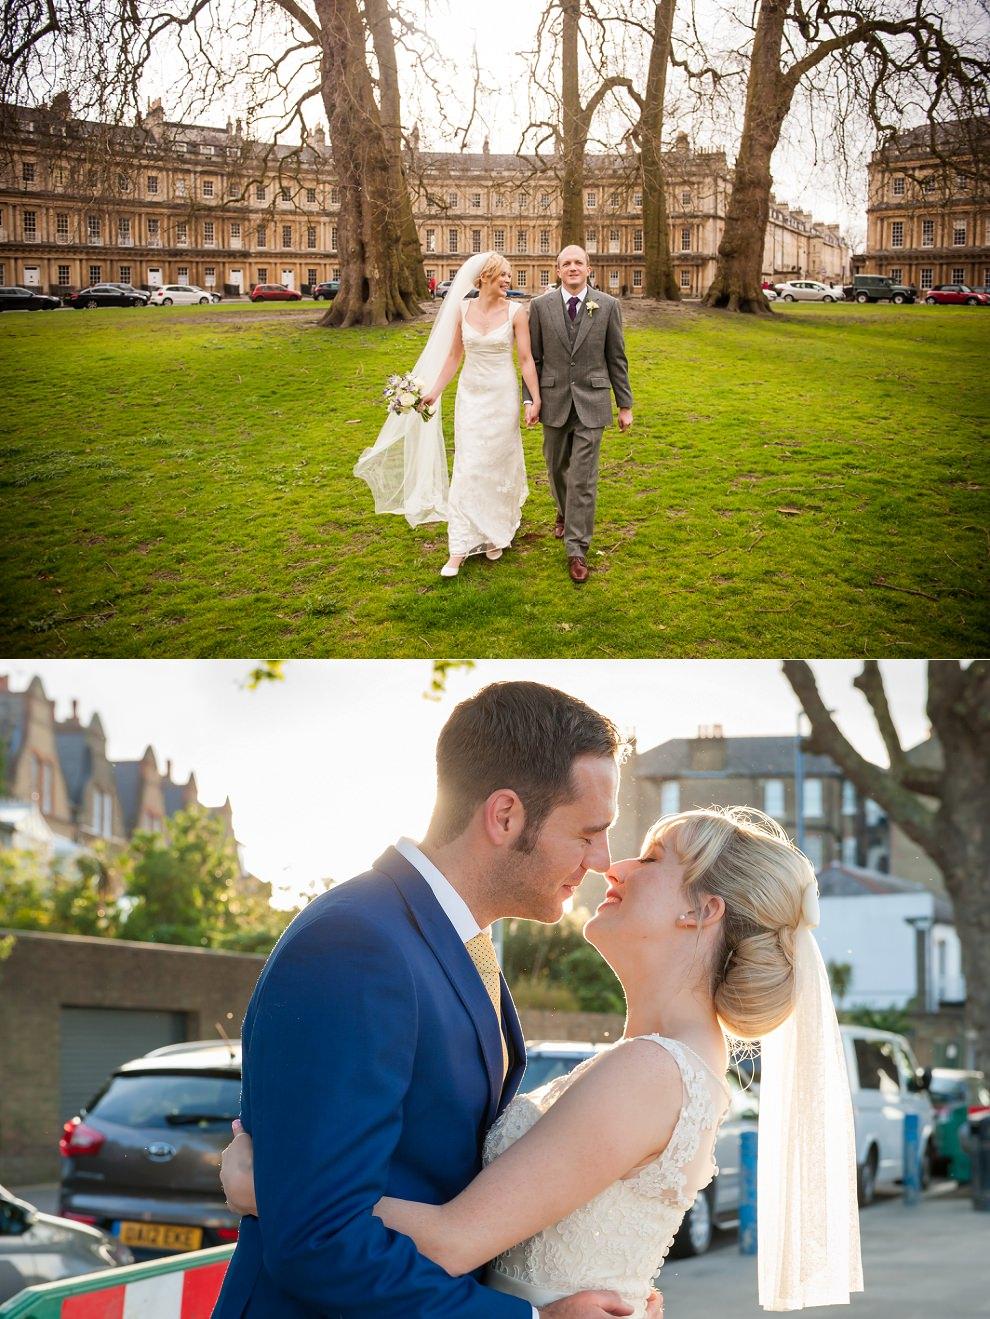 Best-wedding-photos-UK-2015-129